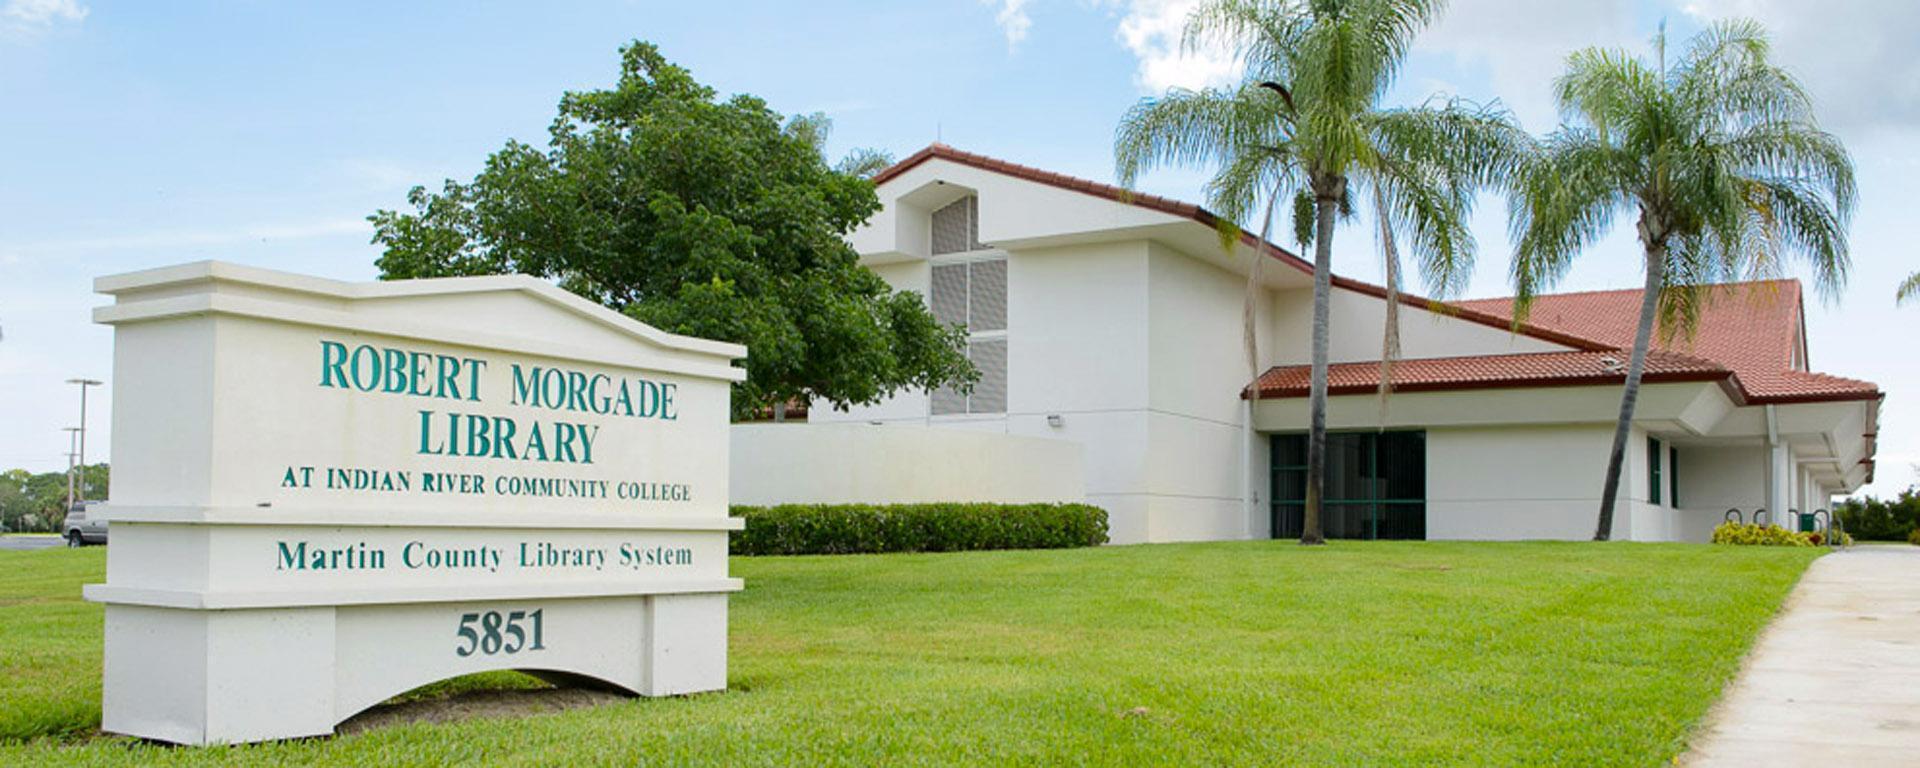 exterior image of the Robert Morgade Library